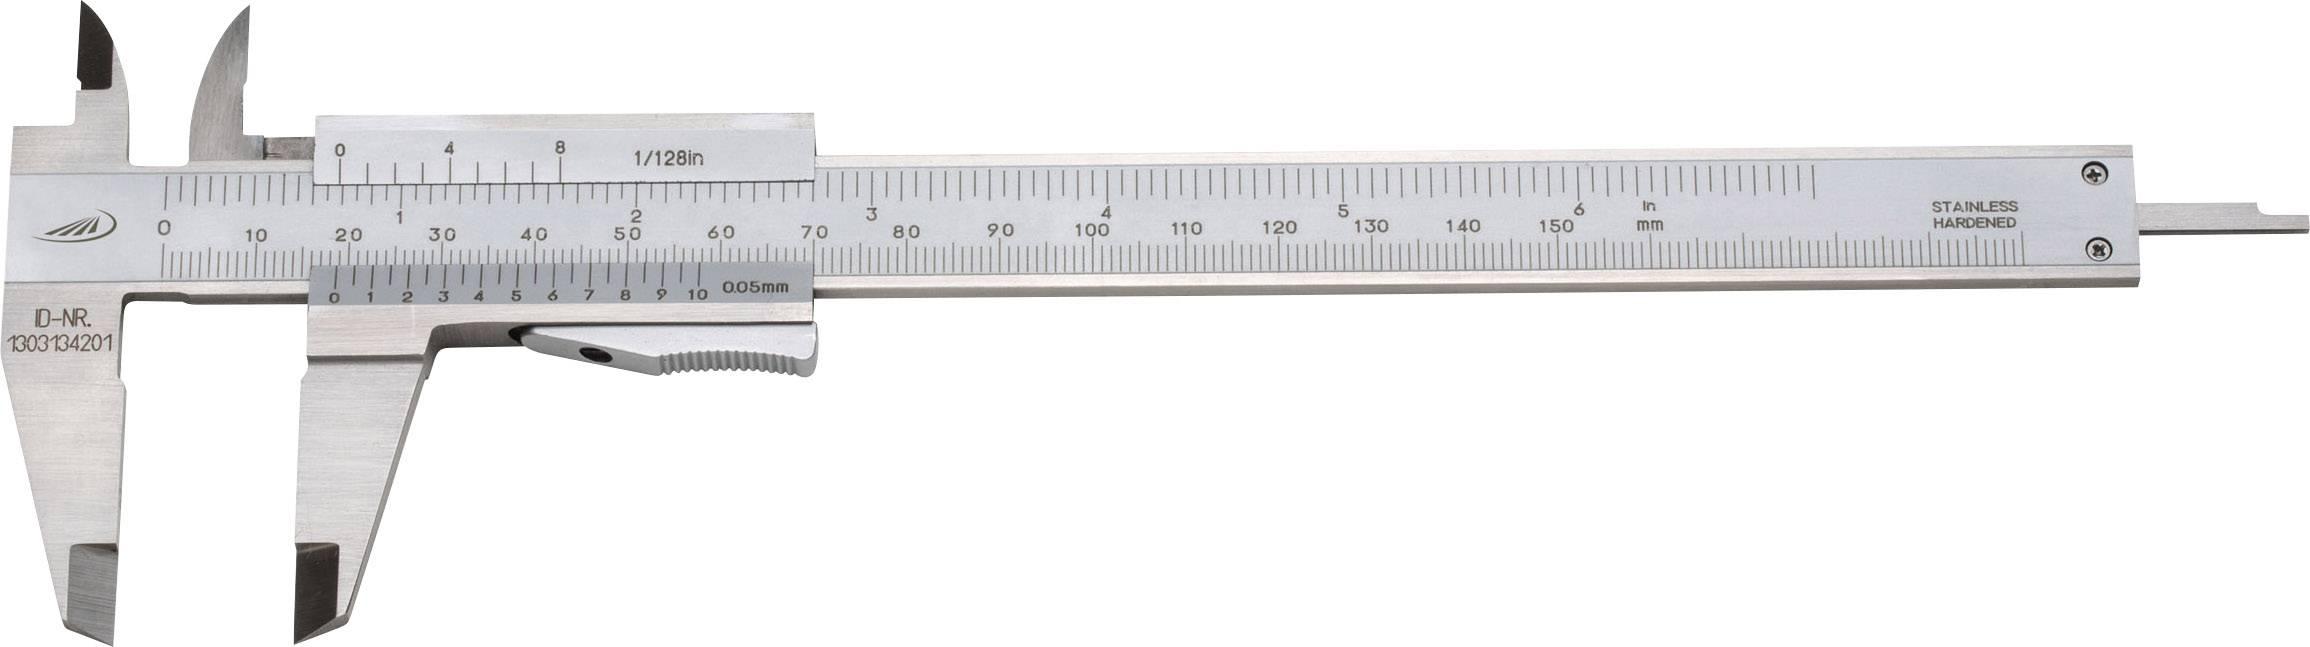 Digitálne posuvné meradlo Helios Preisser 0184 501, rozsah merania 150 mm